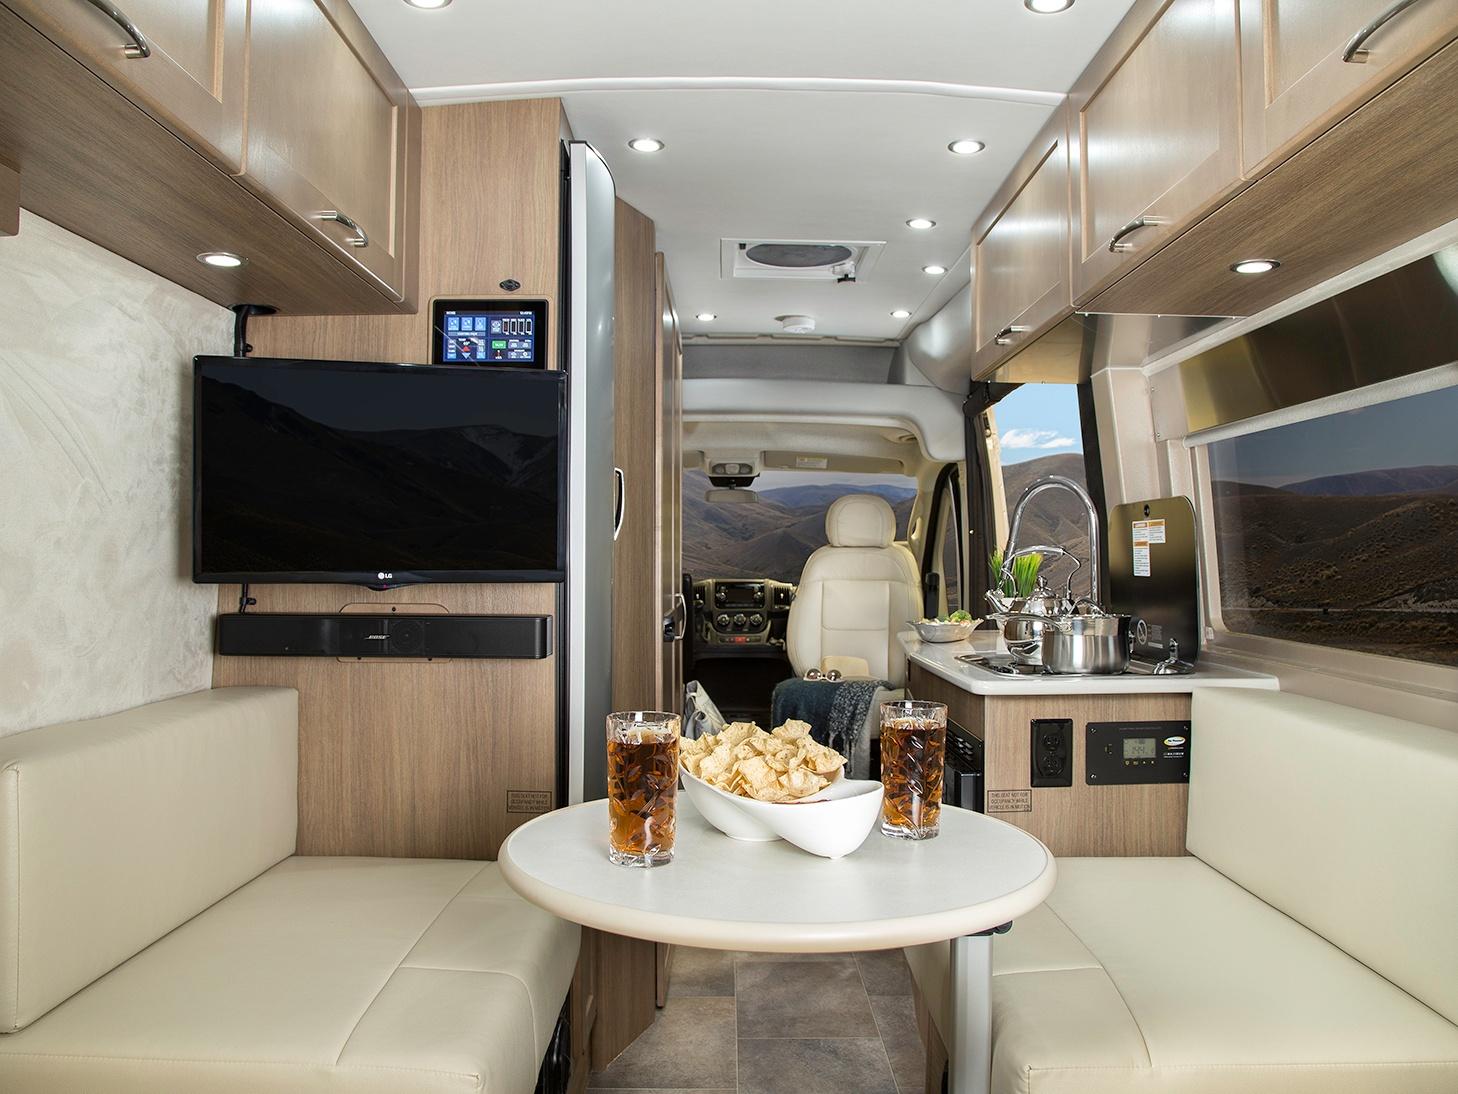 Interior of Pleasure-Way Lexor TS Class B Motorhome